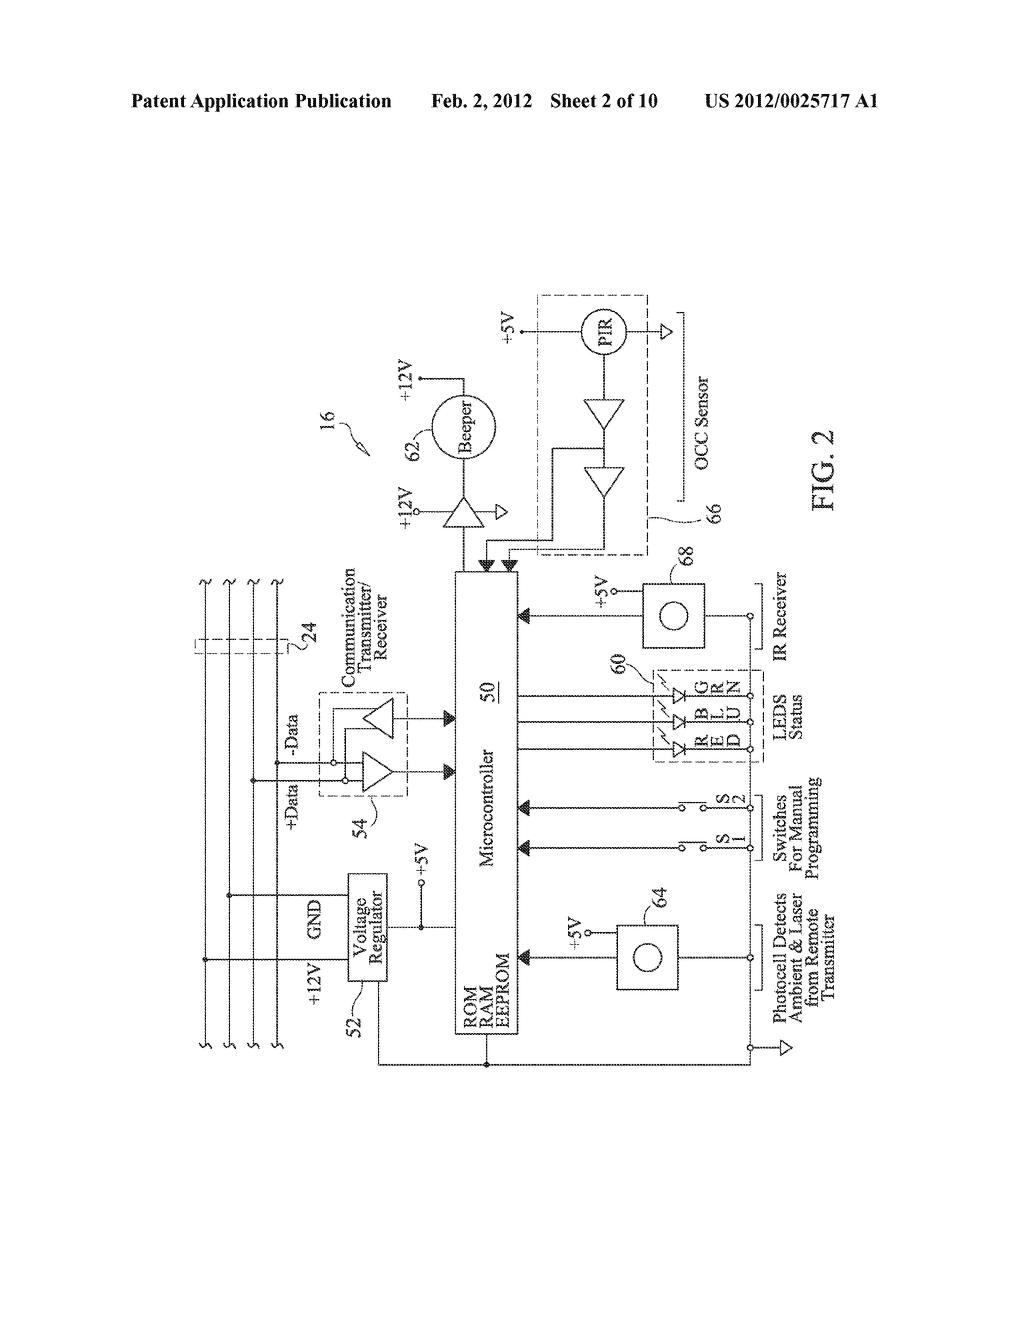 Lighting Control Diagram : 24 Wiring Diagram Images